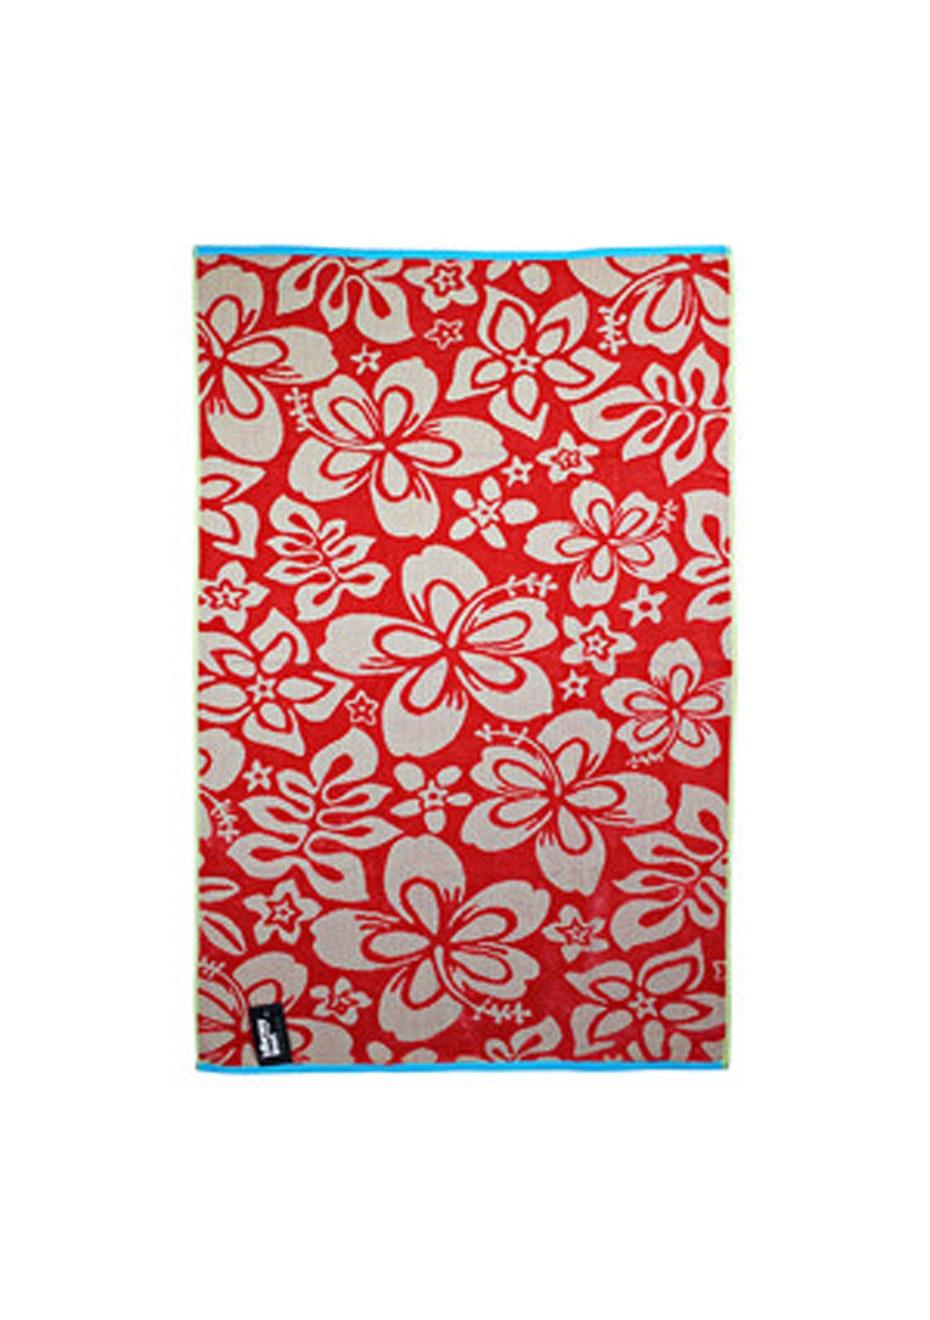 Indie Rose 100% Cotton Velour Jacquard Beach Towel - 80x160cm